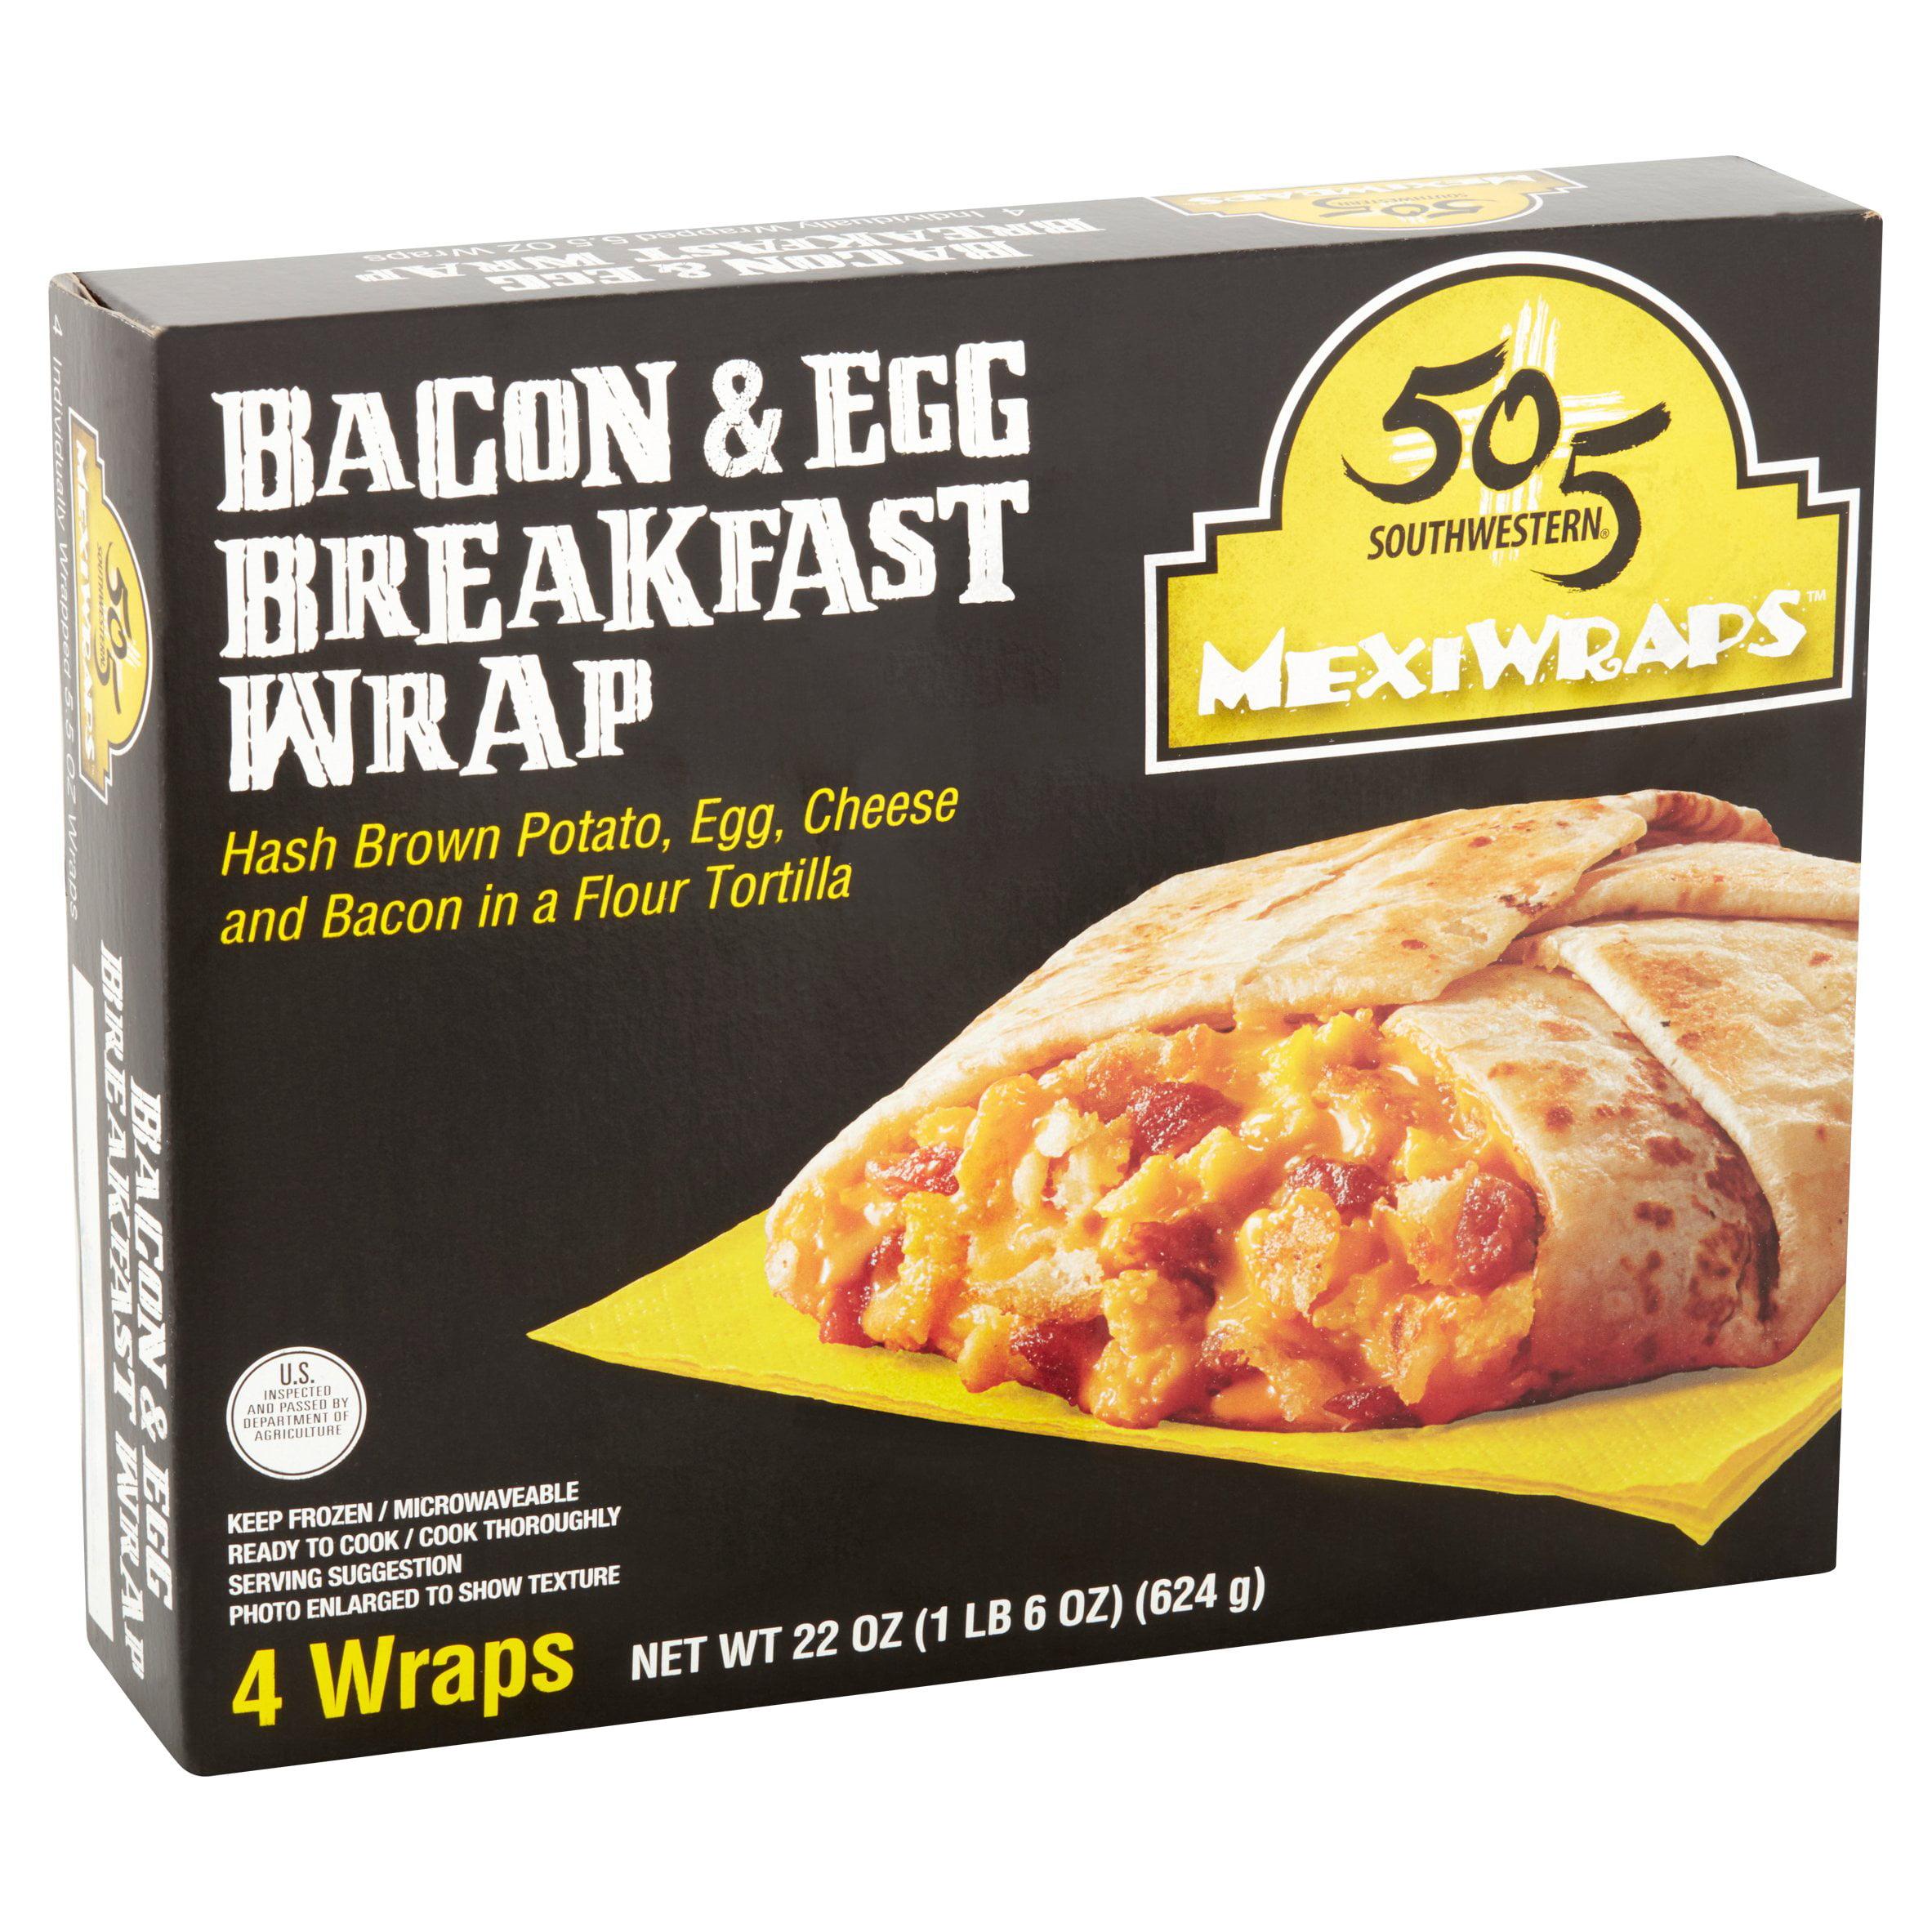 505 Southwestern MexiWraps Bacon & Egg Breakfast Wrap, 5.5 oz, 4 count